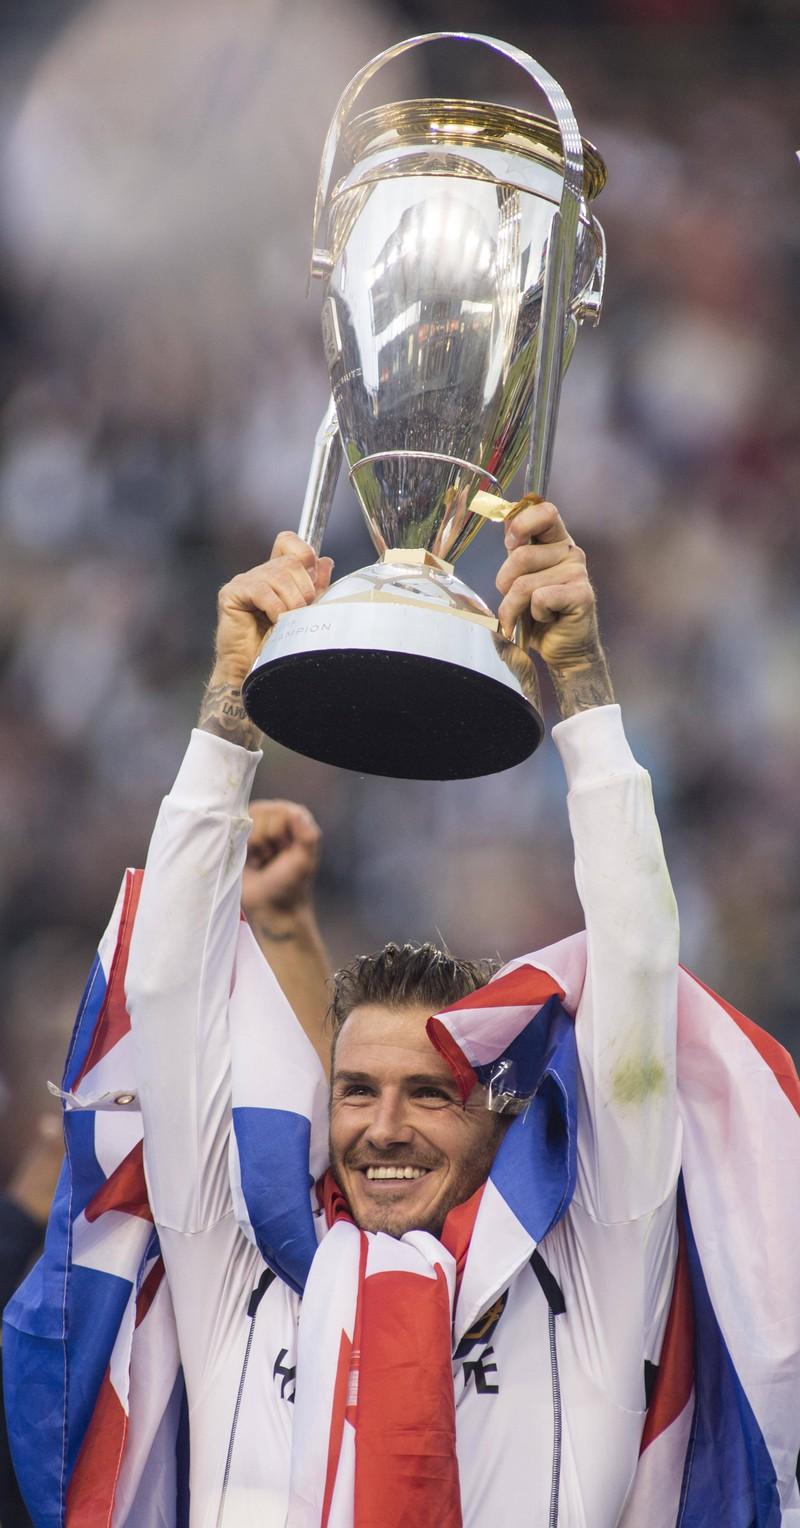 Fußball-Legende David Beckham früher.